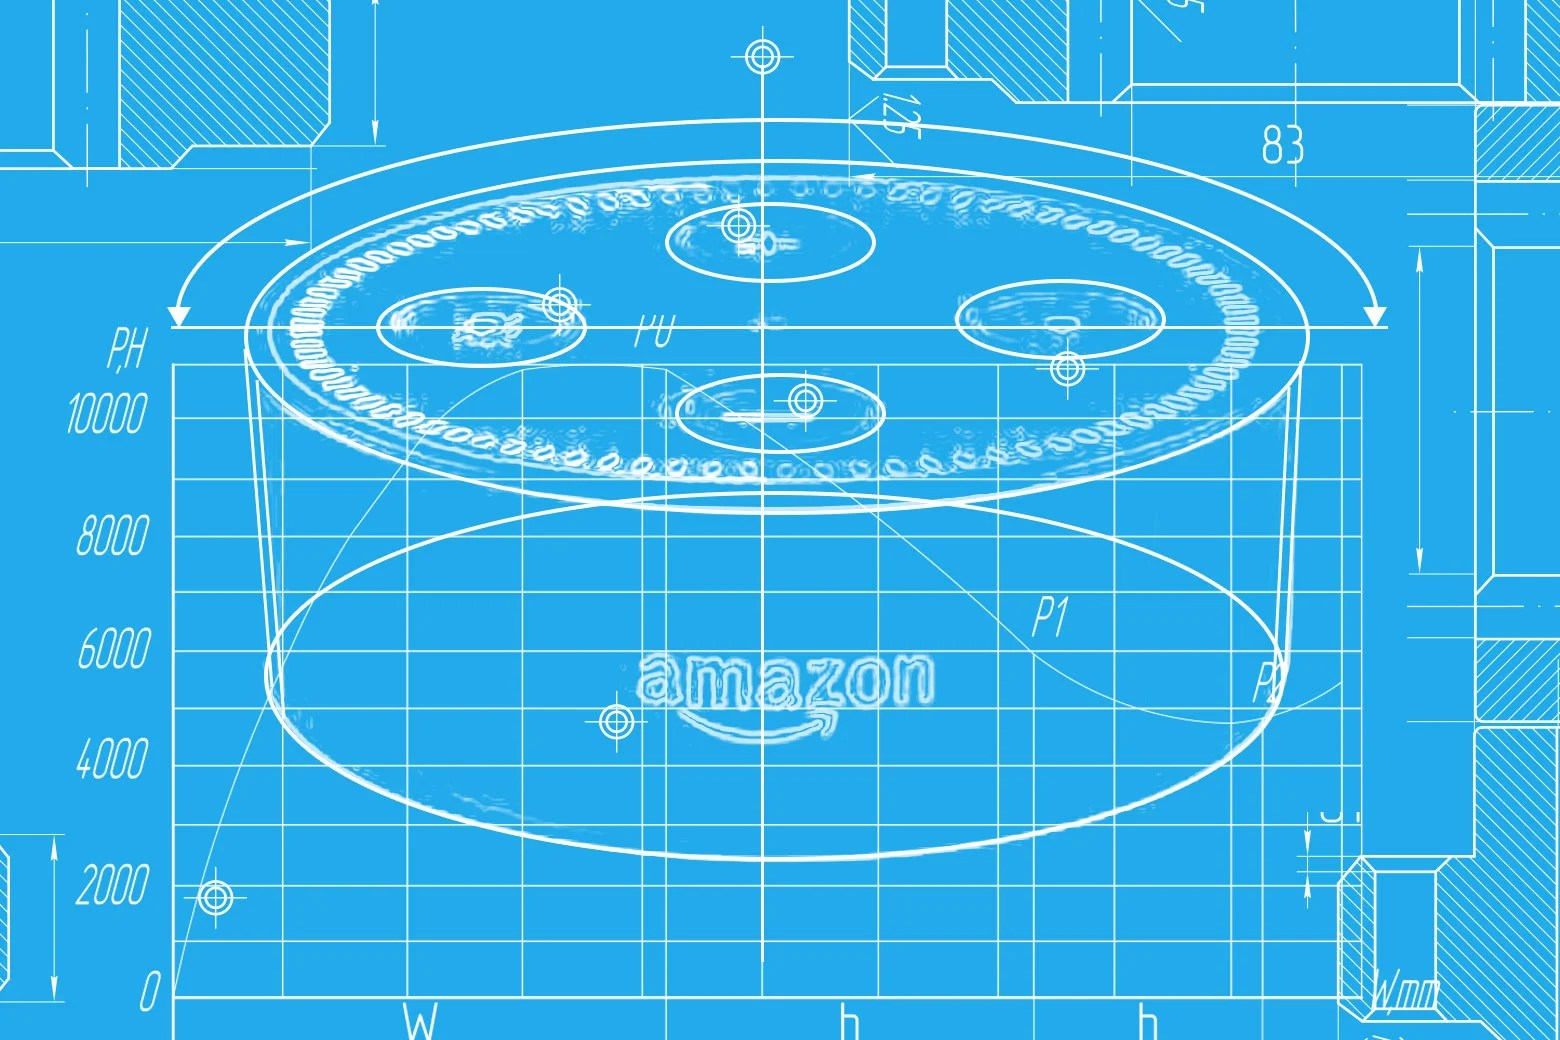 alexa blueprints amazon echo